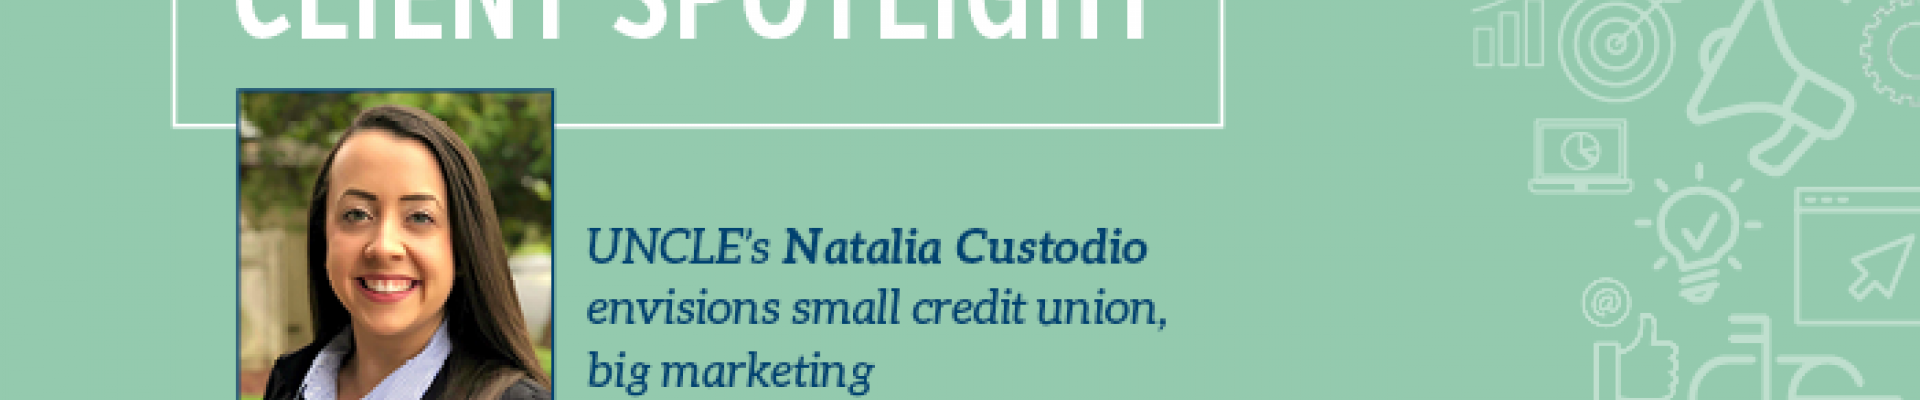 Client Spotlight: Natalia Custodio Envisions Small CU, Big Marketing